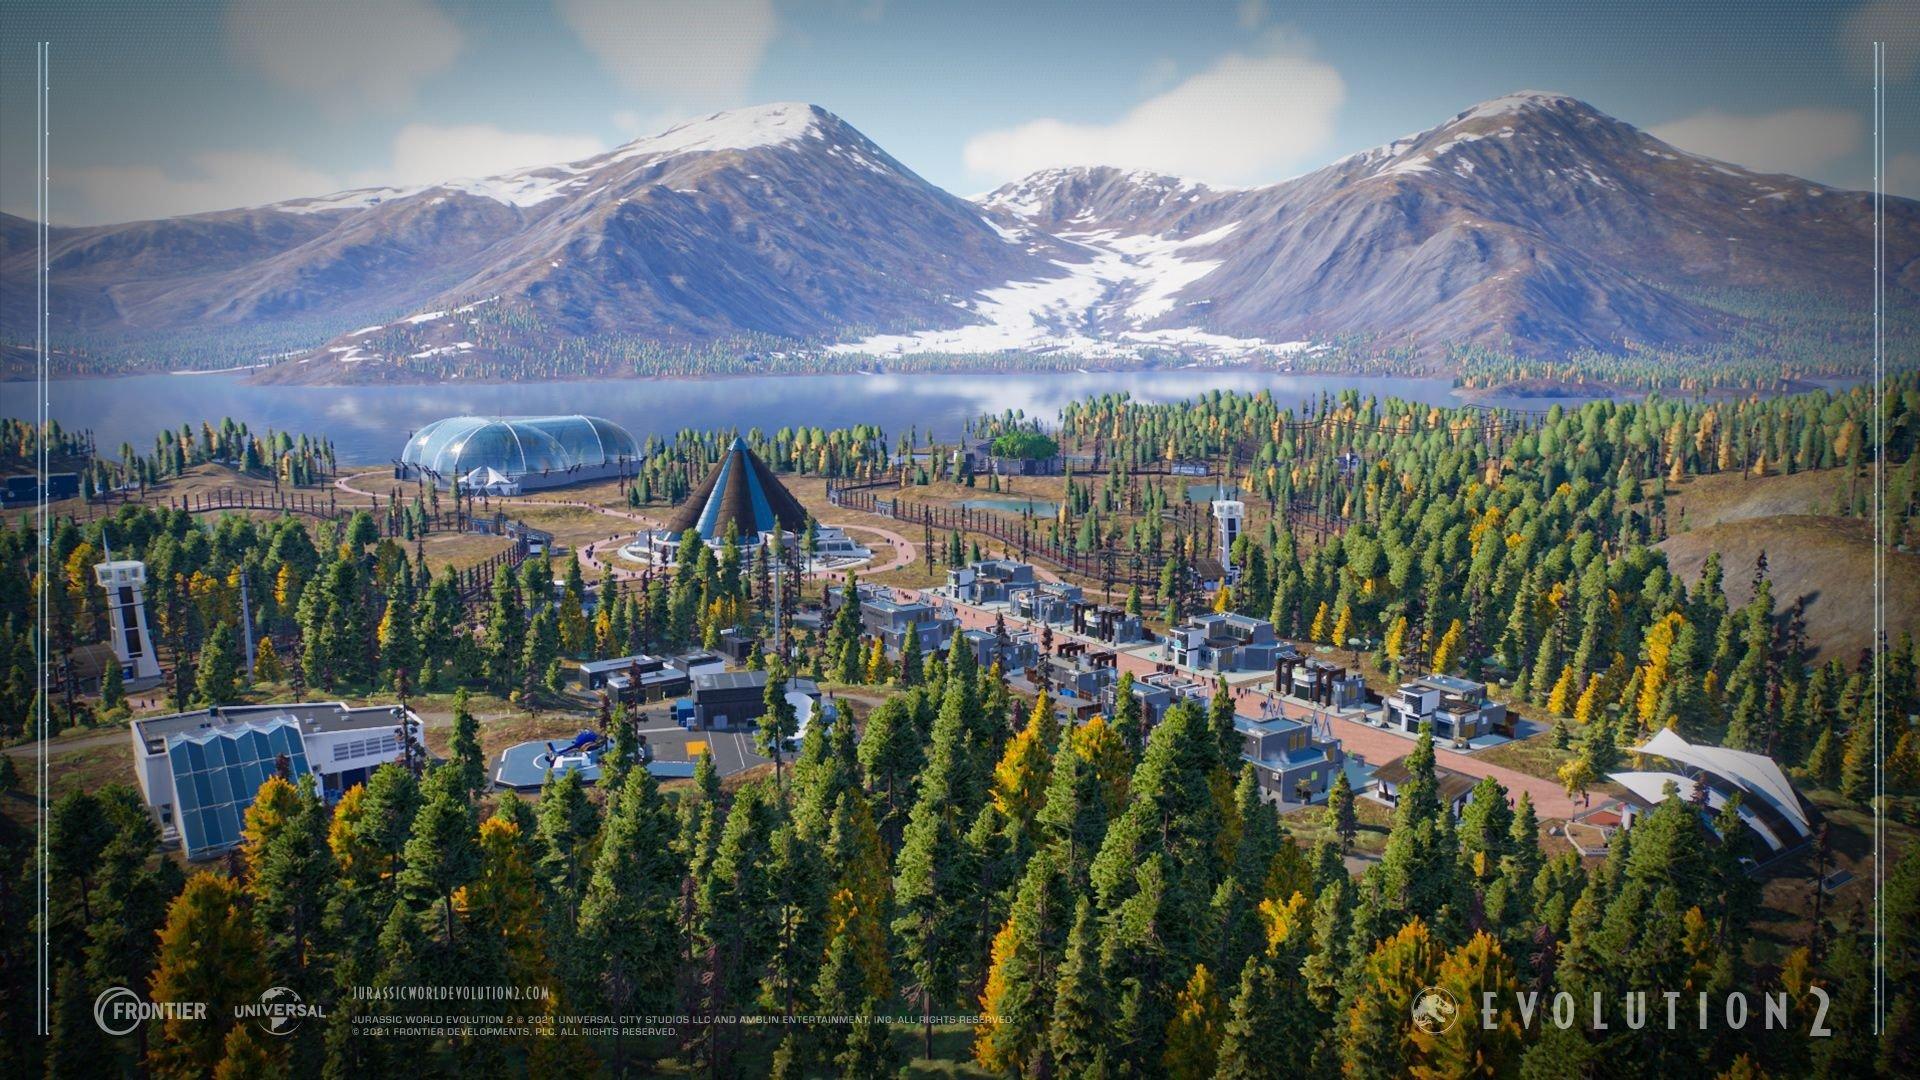 Jurassic-World-Evolution-2-Screenshot-Announcement-Summer-Game-Fest-2021-2